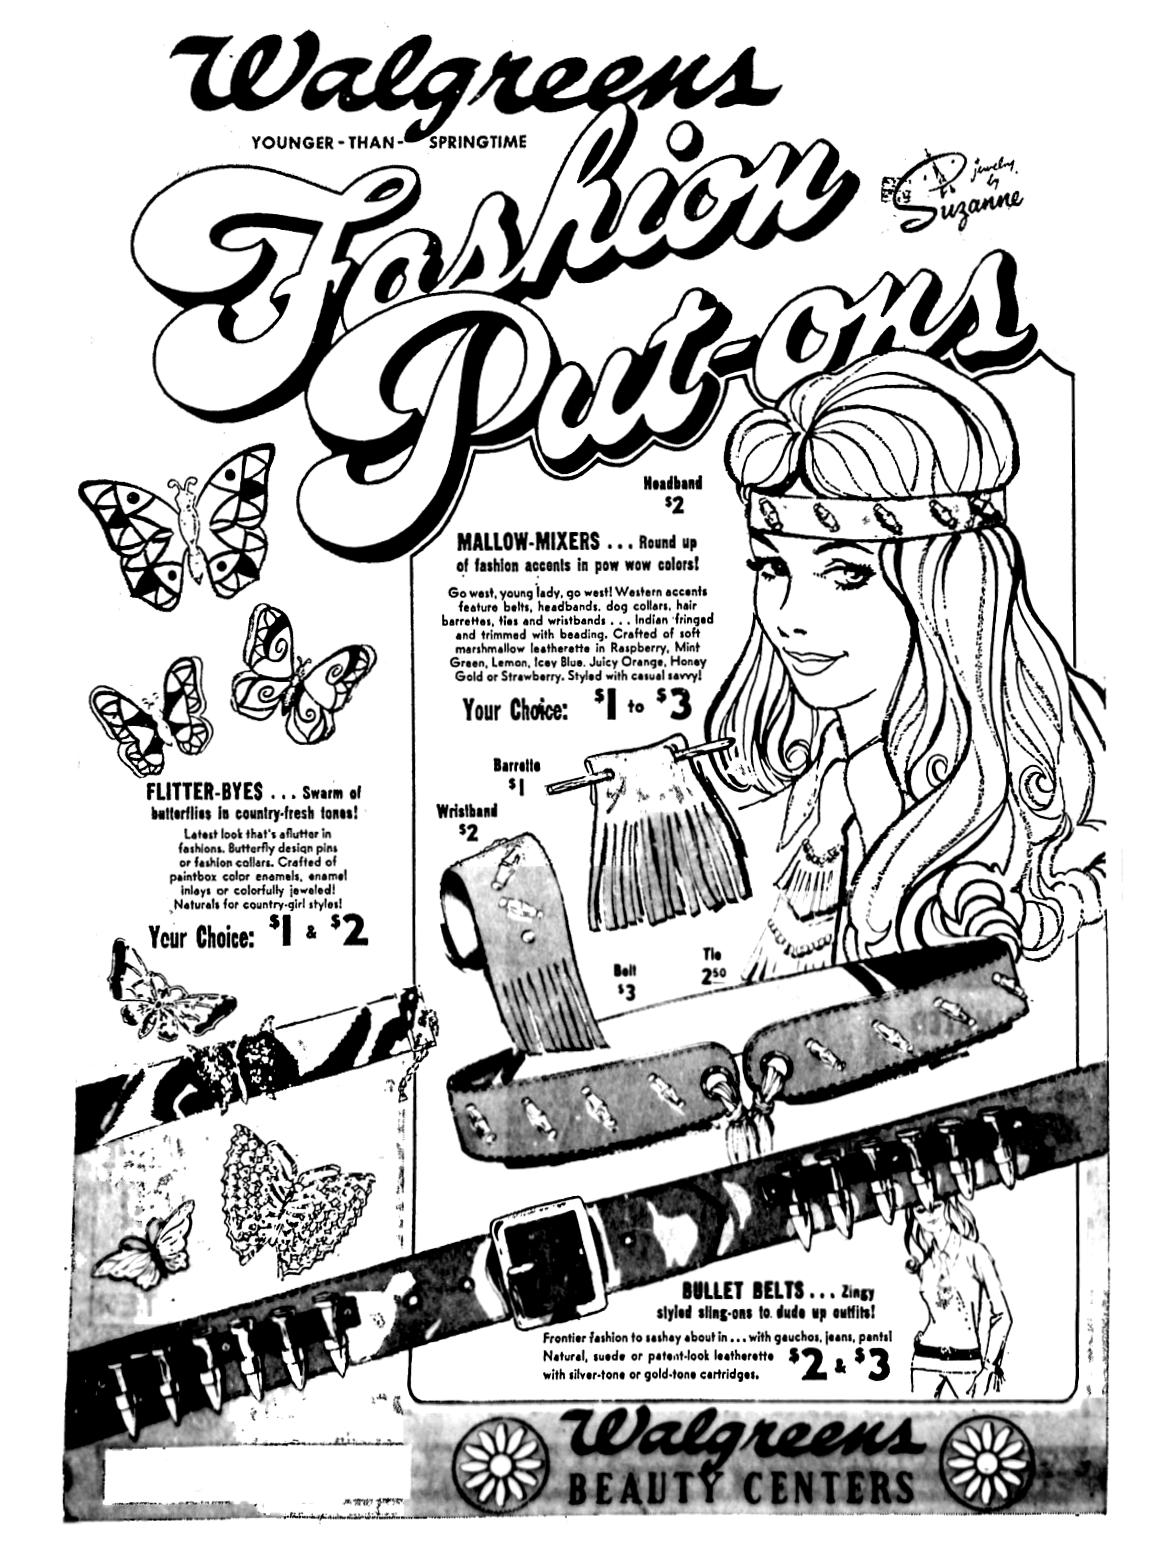 walgreens fashion put ons april 1971 1970 s 1980 s newspaper Fashion Jeans walgreens fashion put ons april 1971 newspaper advertisement retro vintage 1970s sons